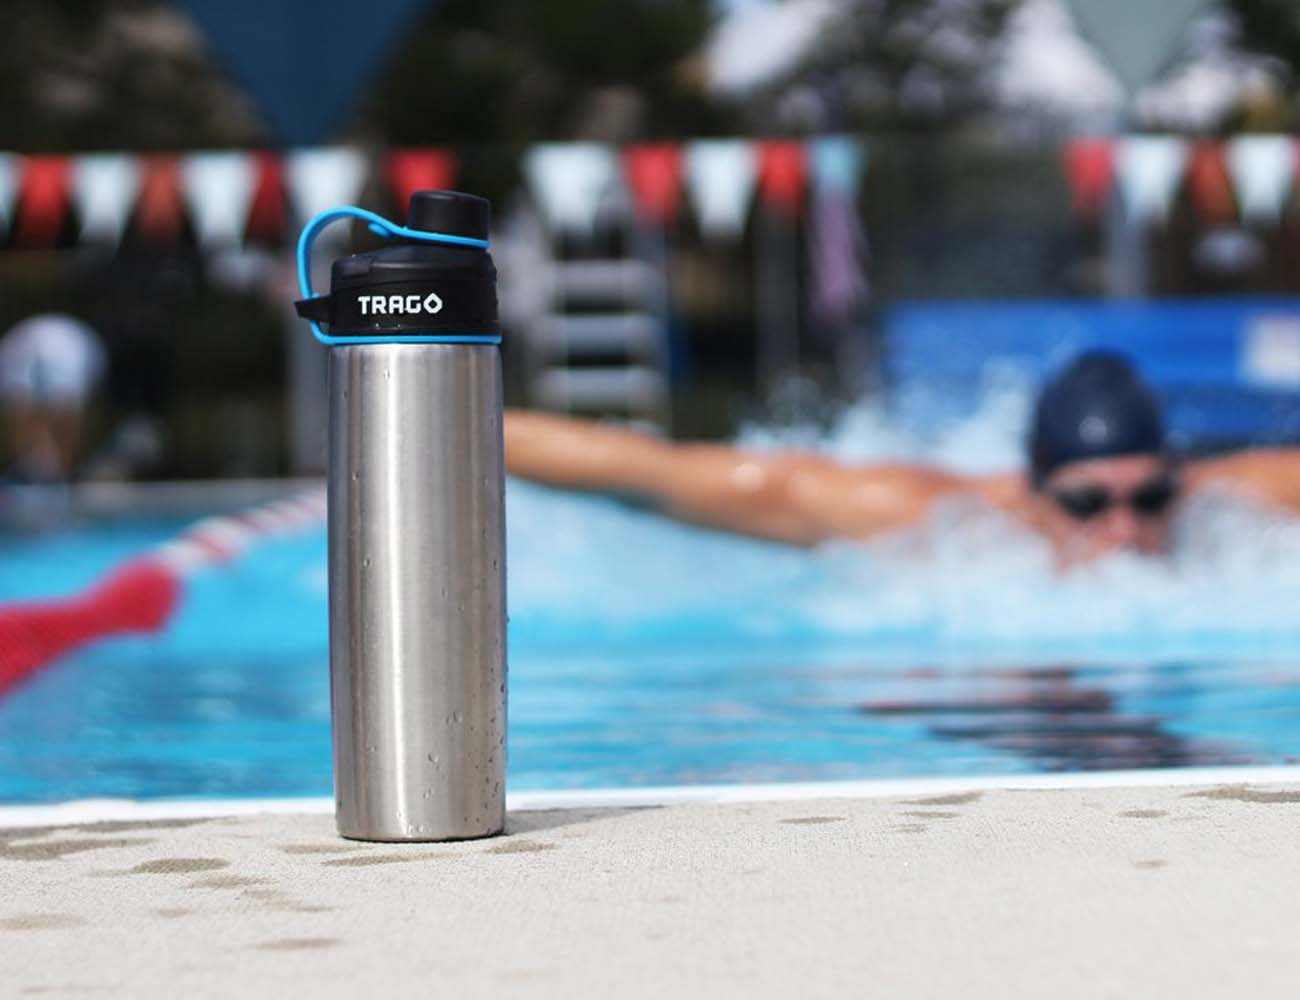 Trago – The World's First Smart Water Bottle